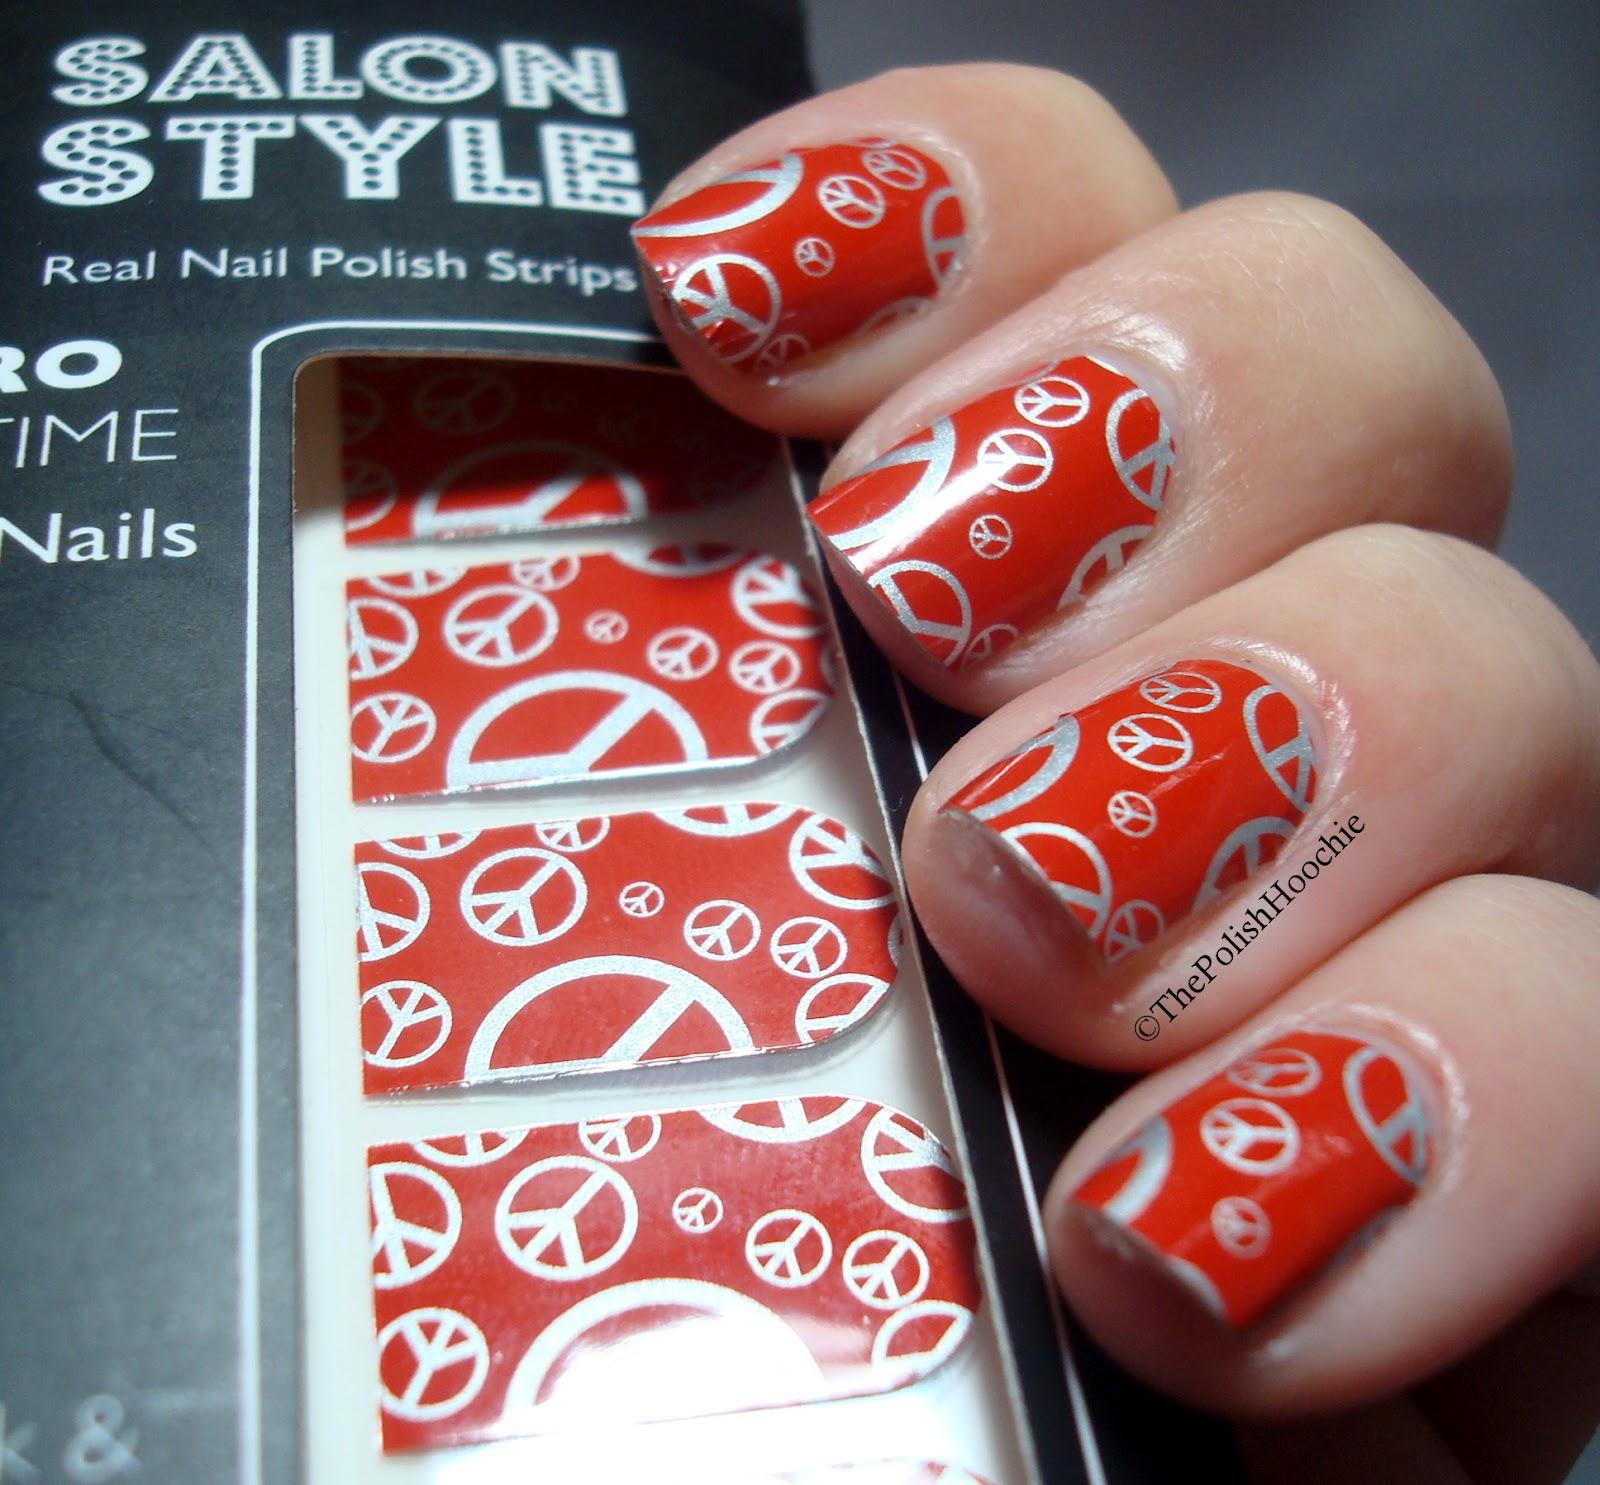 Nail Polish Style: ThePolishHoochie: Salon Style Real Nail Polish Strips